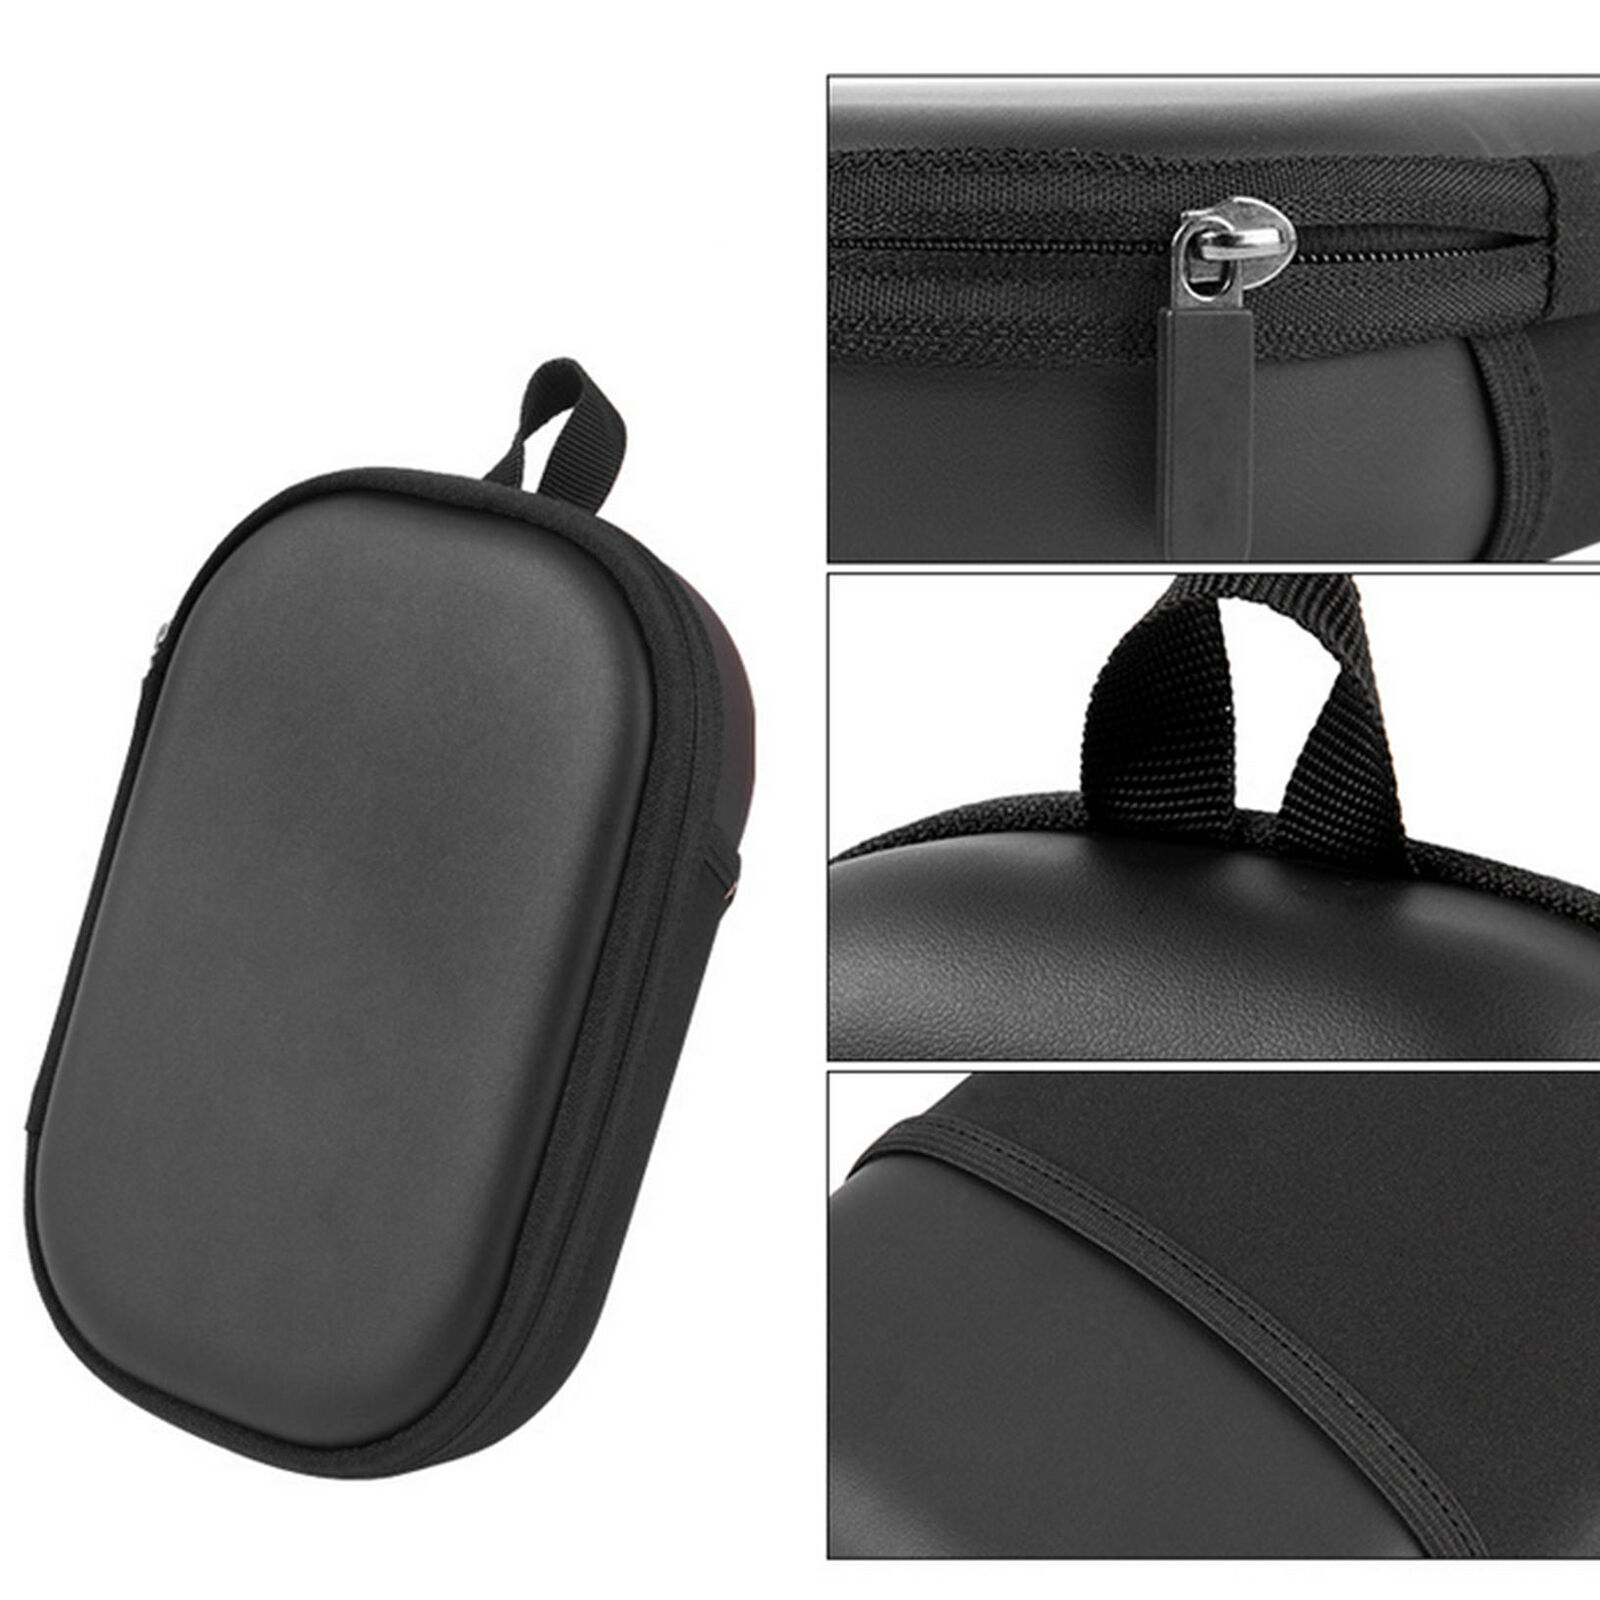 EVA Protective Bag Carrying Case Box for BOSE QuietComfort/35ii/25/15 Headphone